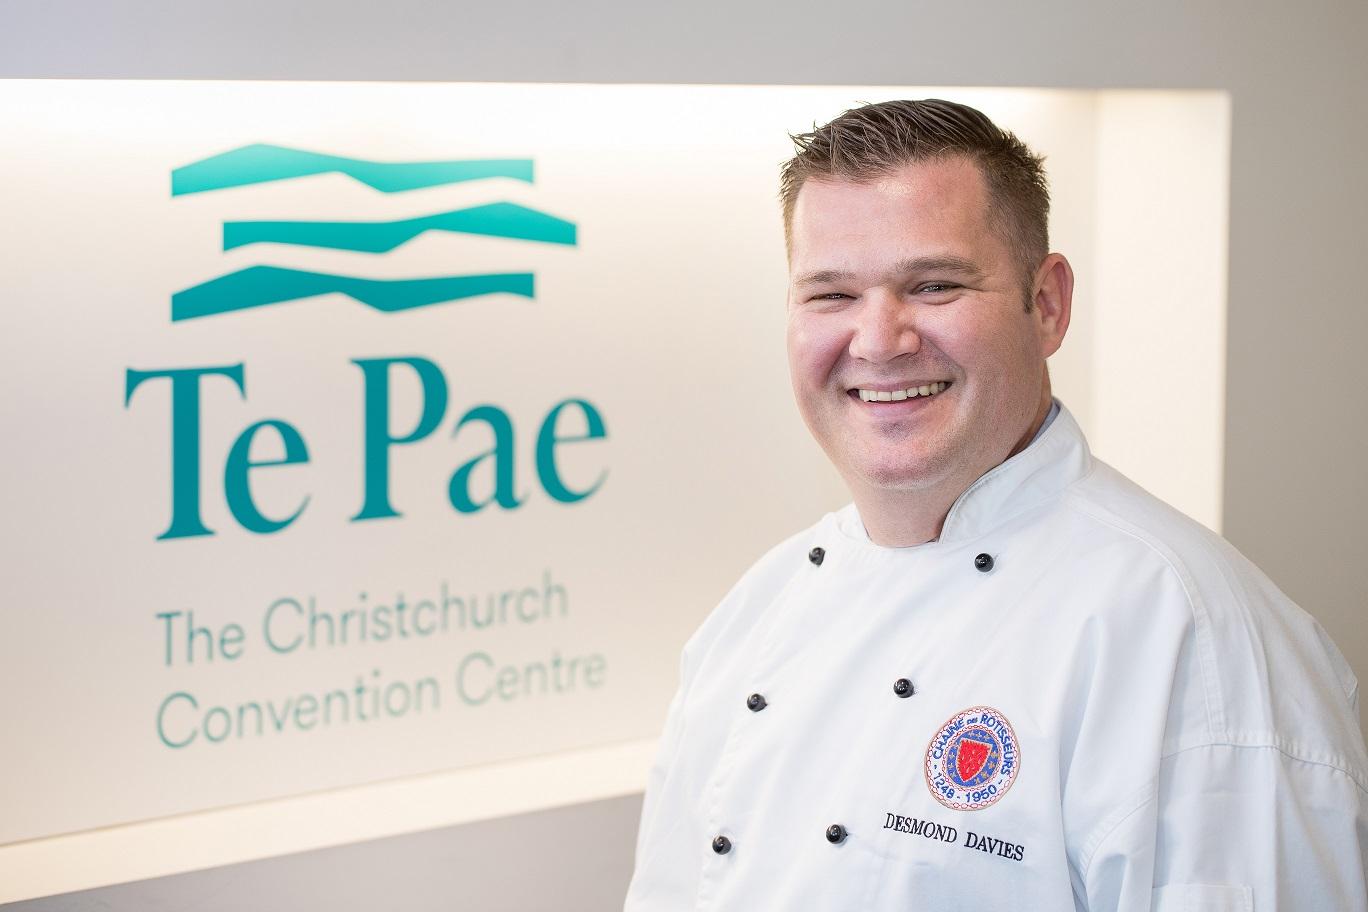 Desmond Davies infront of Te Pae Christchurch logo